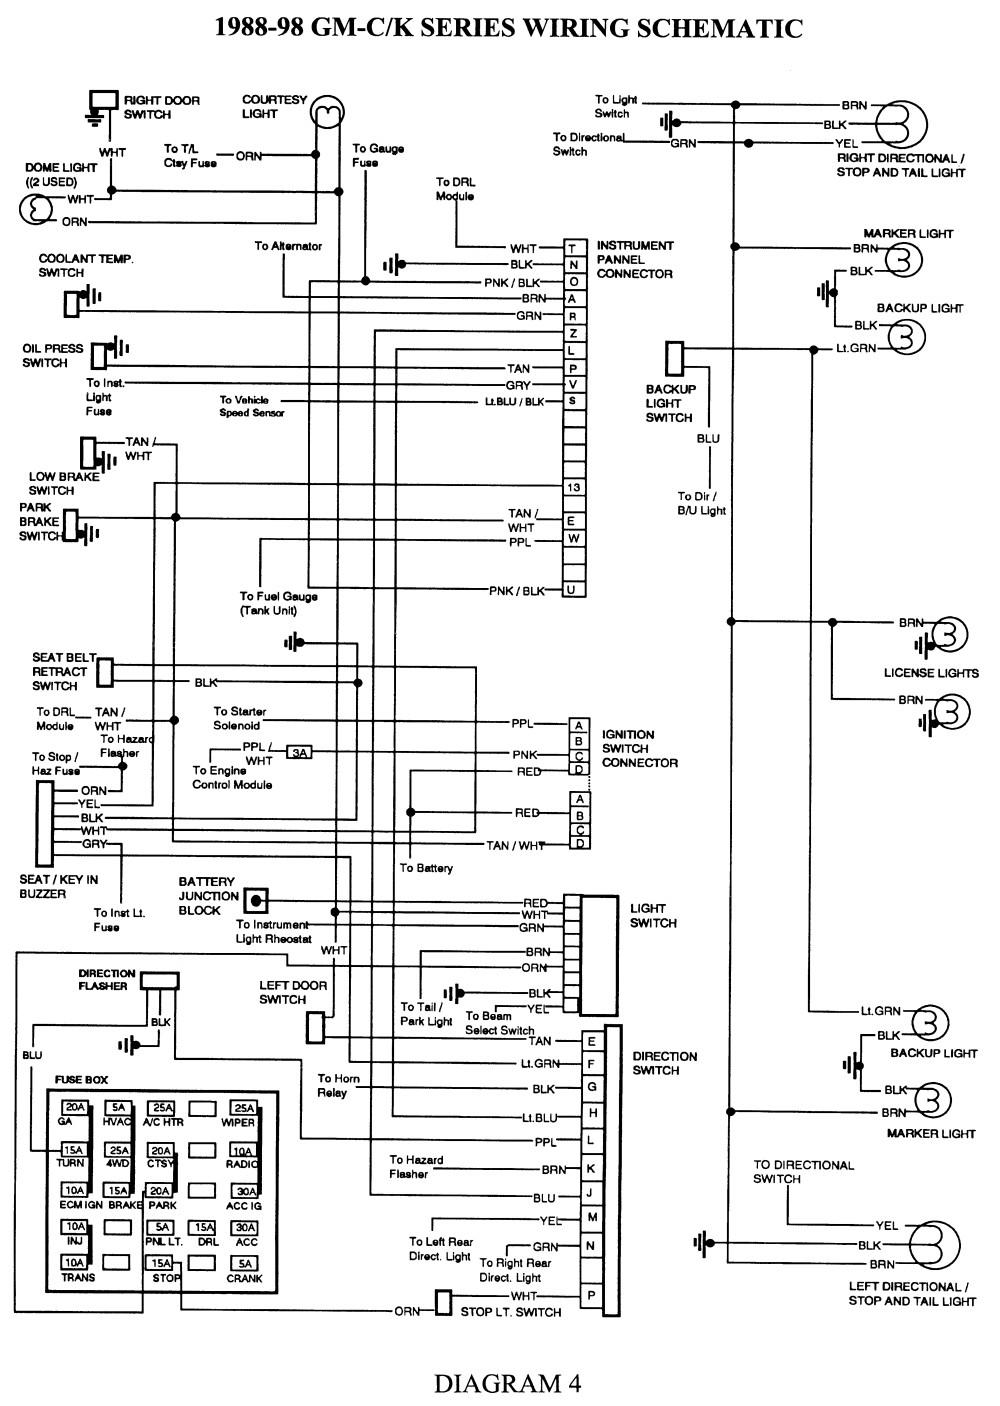 2003 Silverado Tail Light Wiring Harness Anything Diagrams